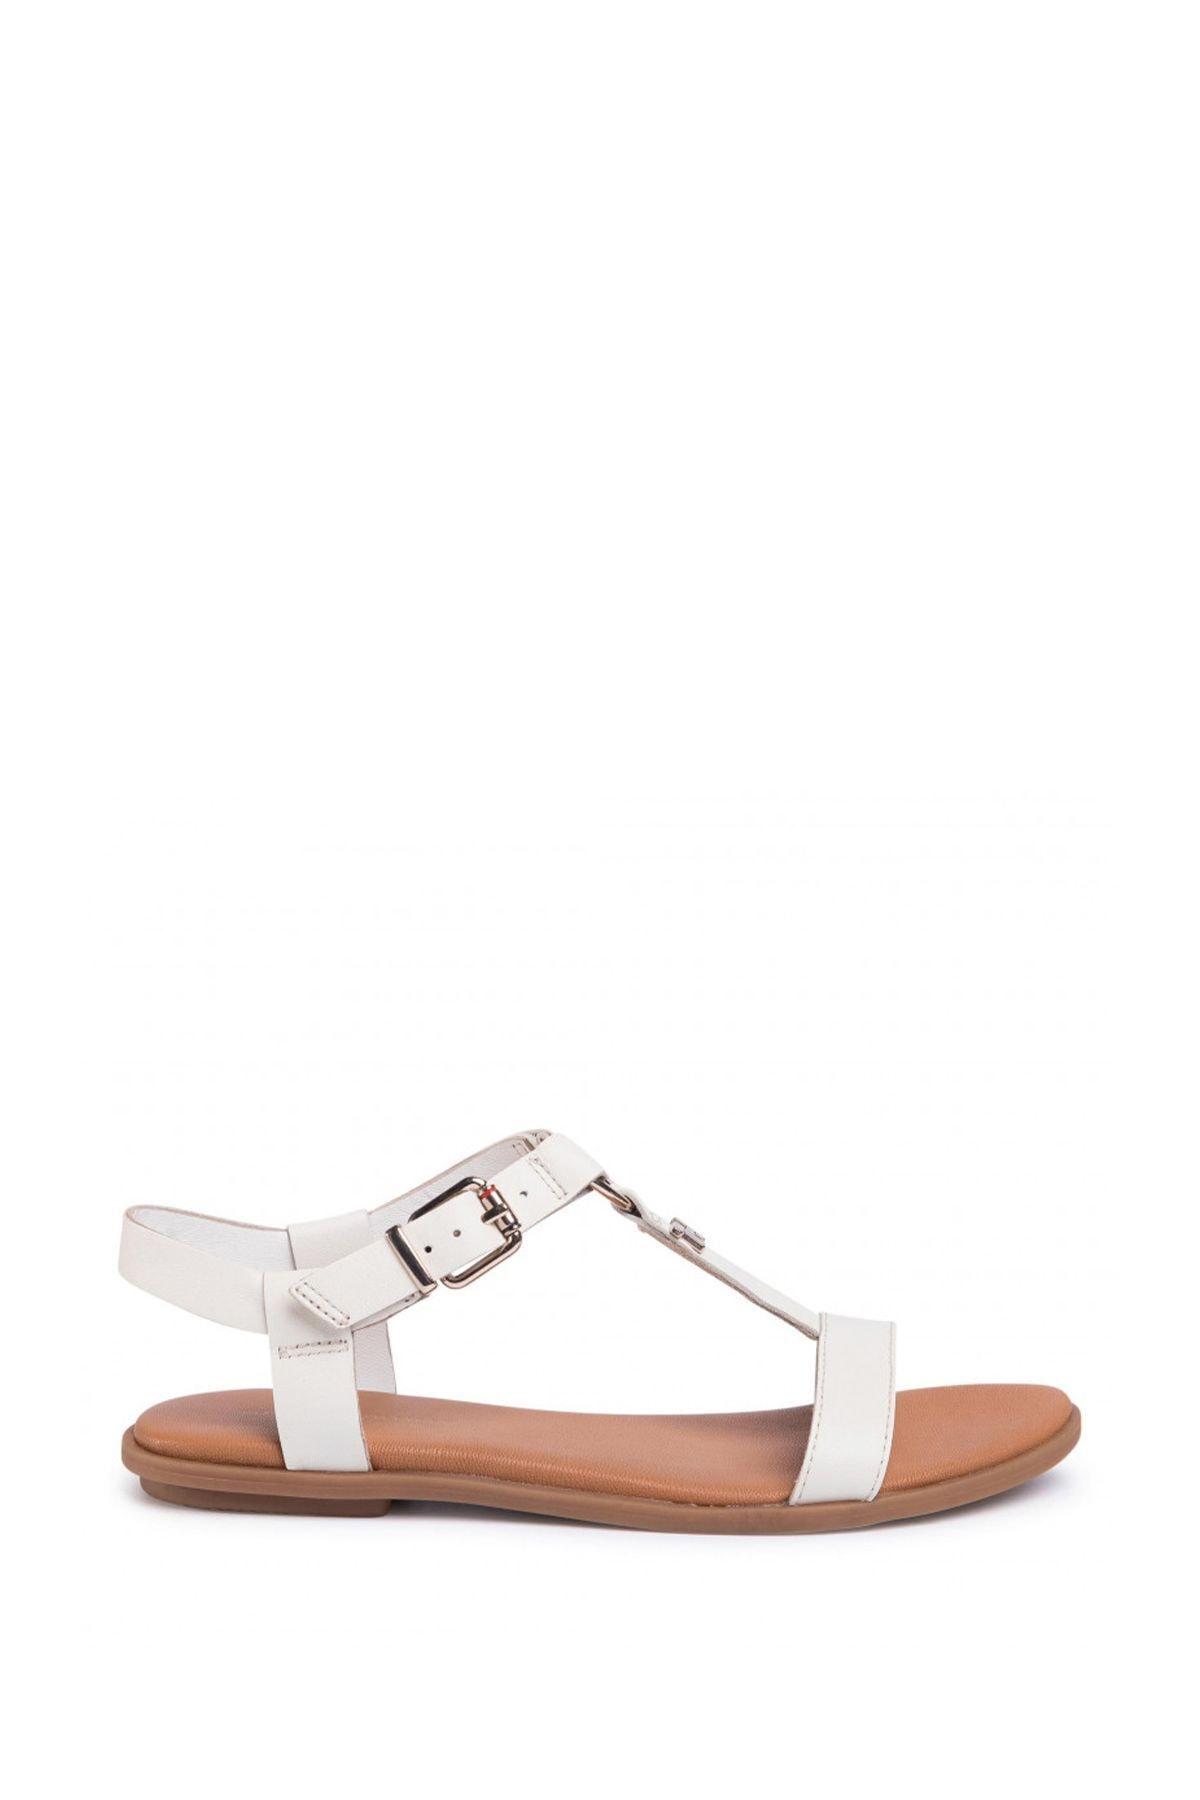 Tommy Hilfiger Kadın Ekru Feminine Leather Flat Sandalet Fw0fw04882 2